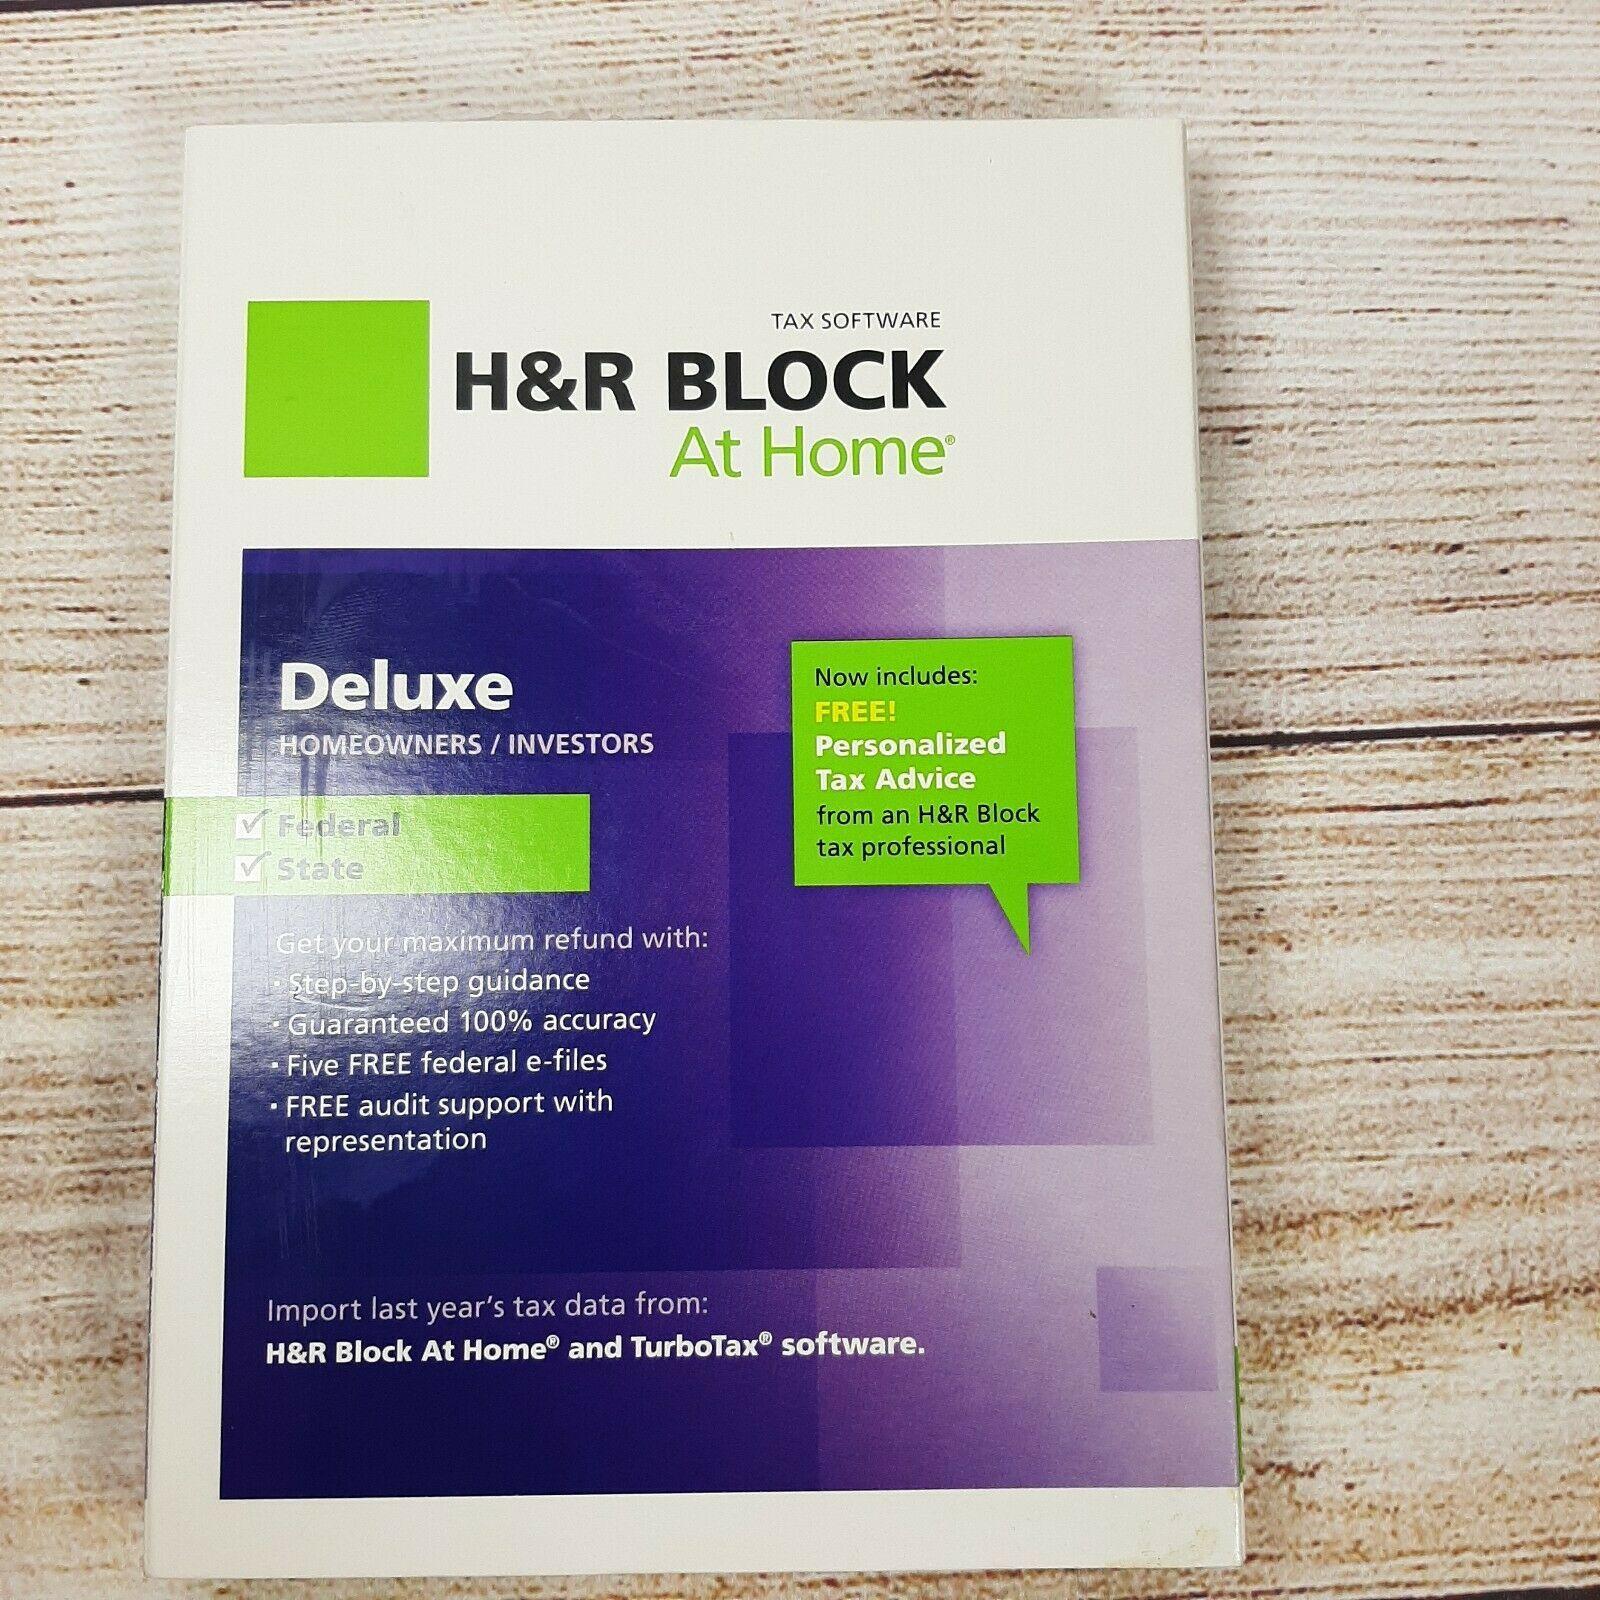 H&R Block At Home Premium 2012 Tax Software Read Description - $5.93